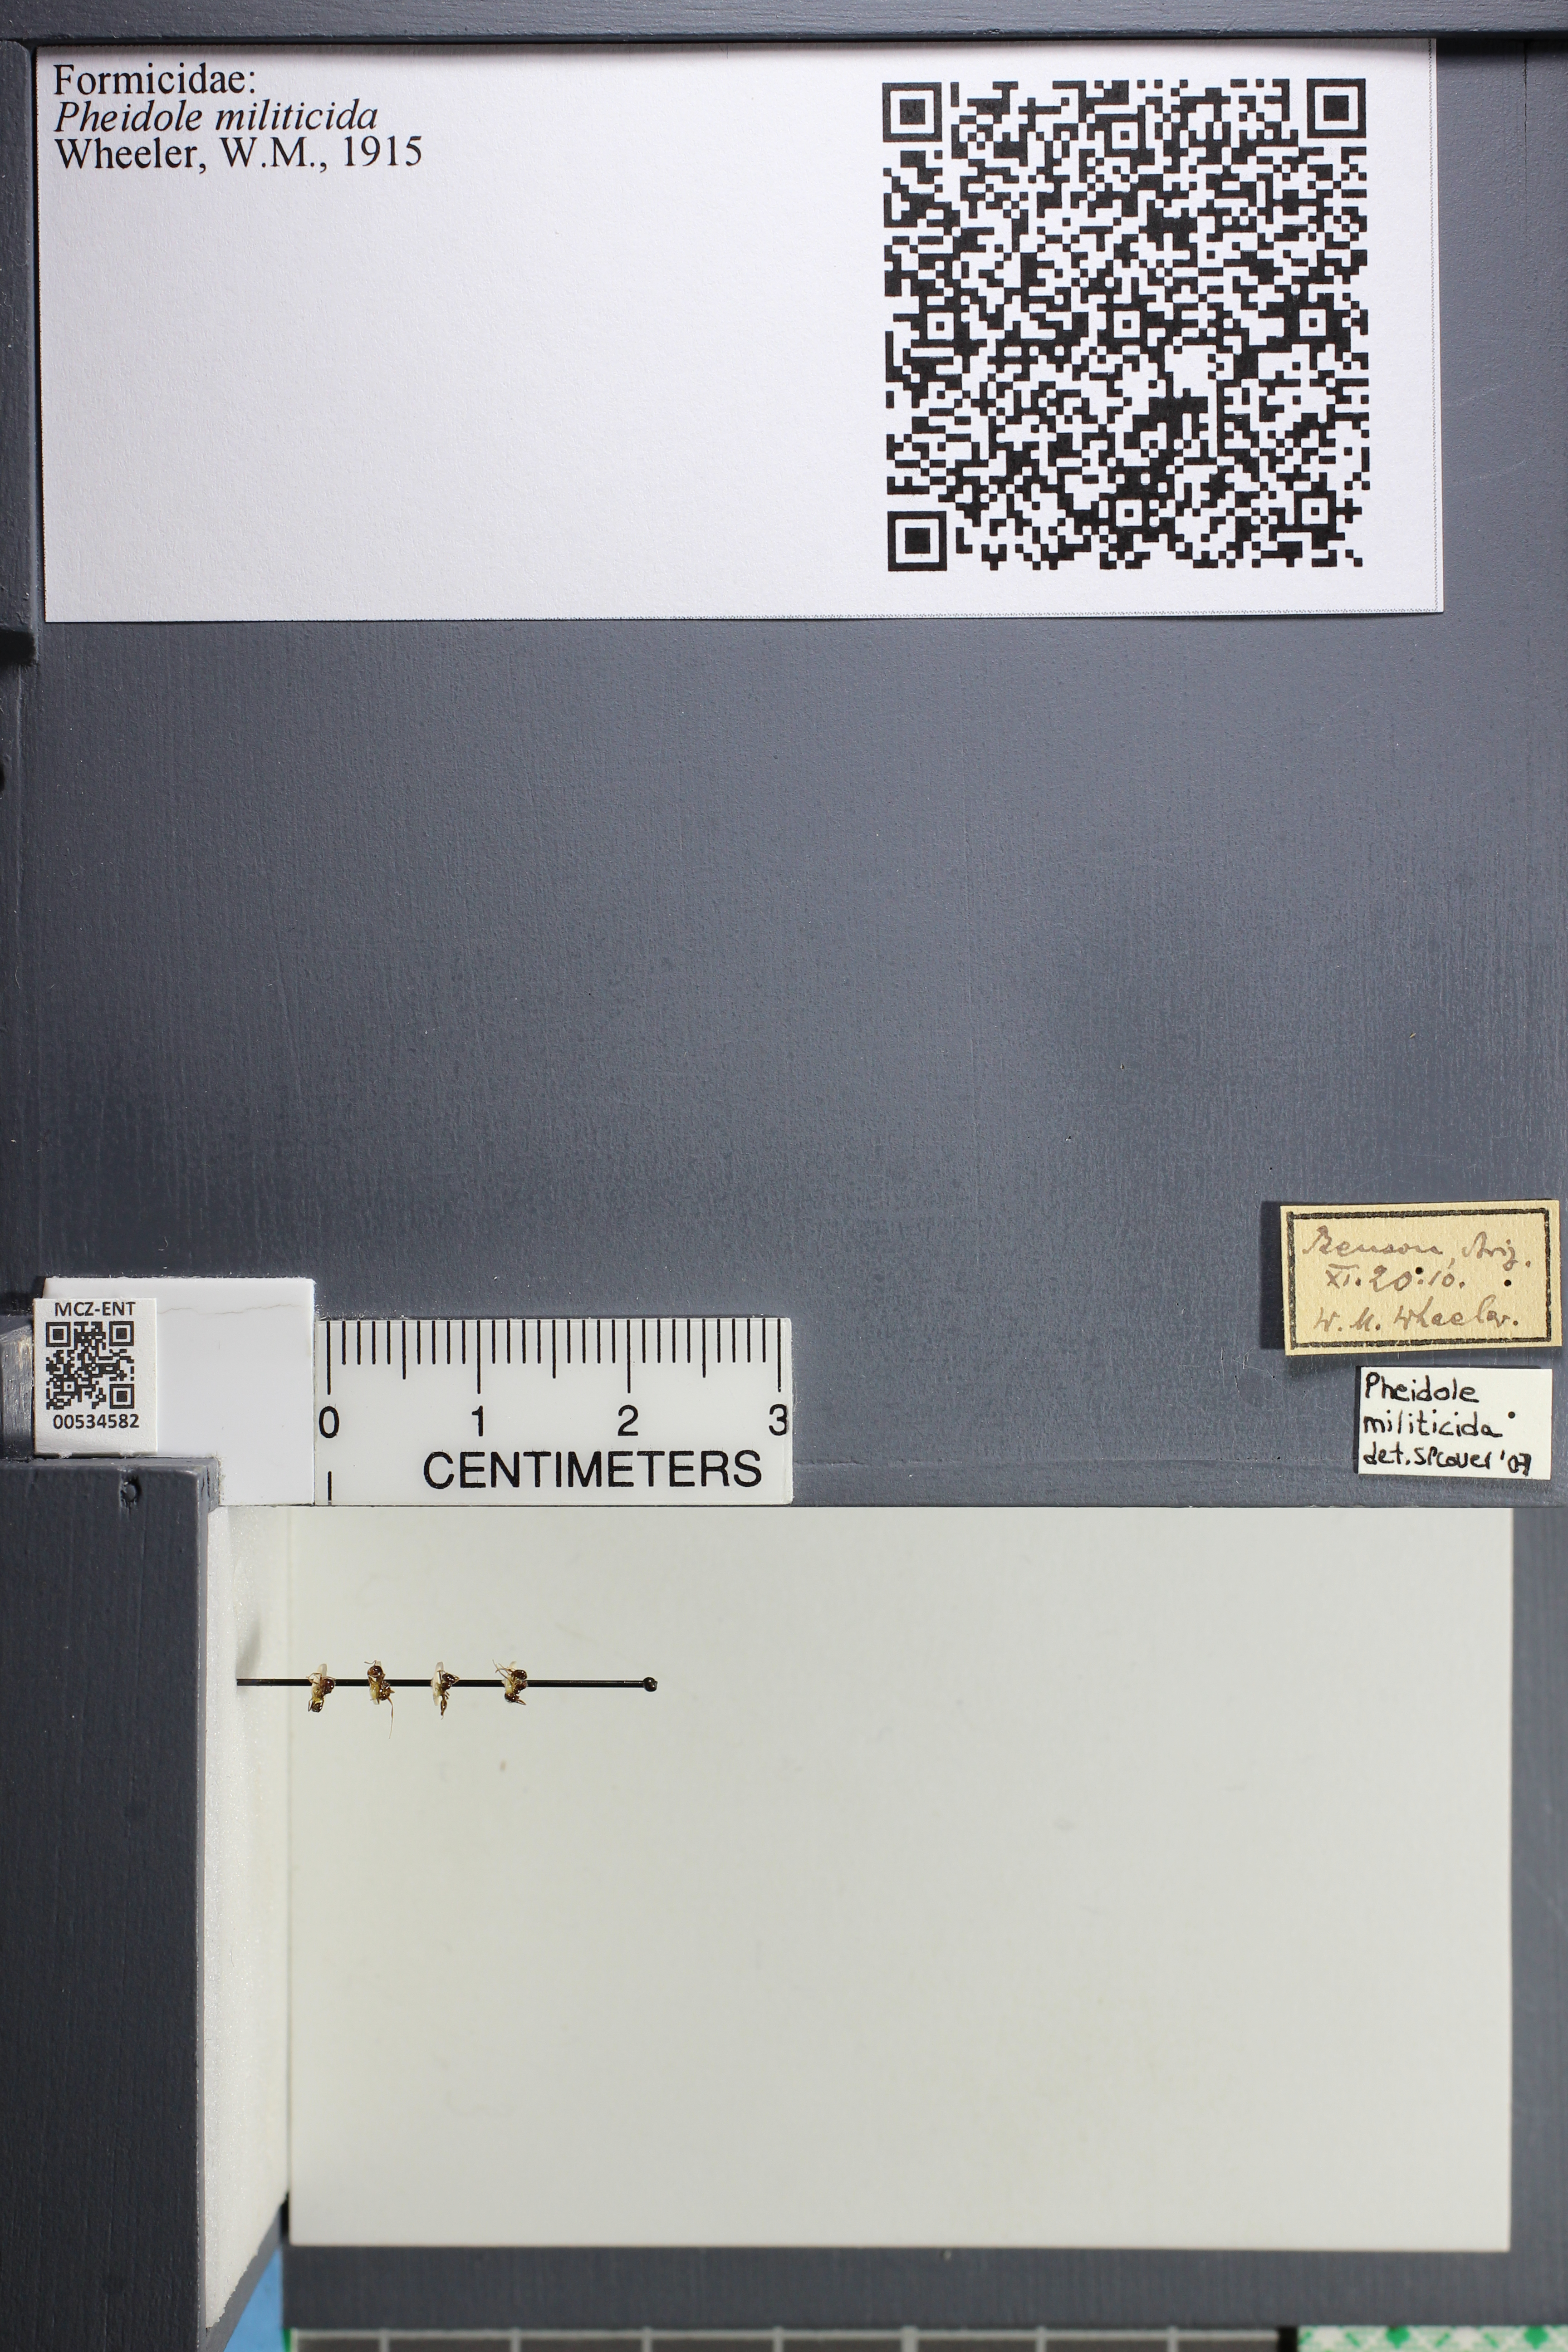 Media of type image, MCZ:Ent:534582 Identified as Pheidole militicida.